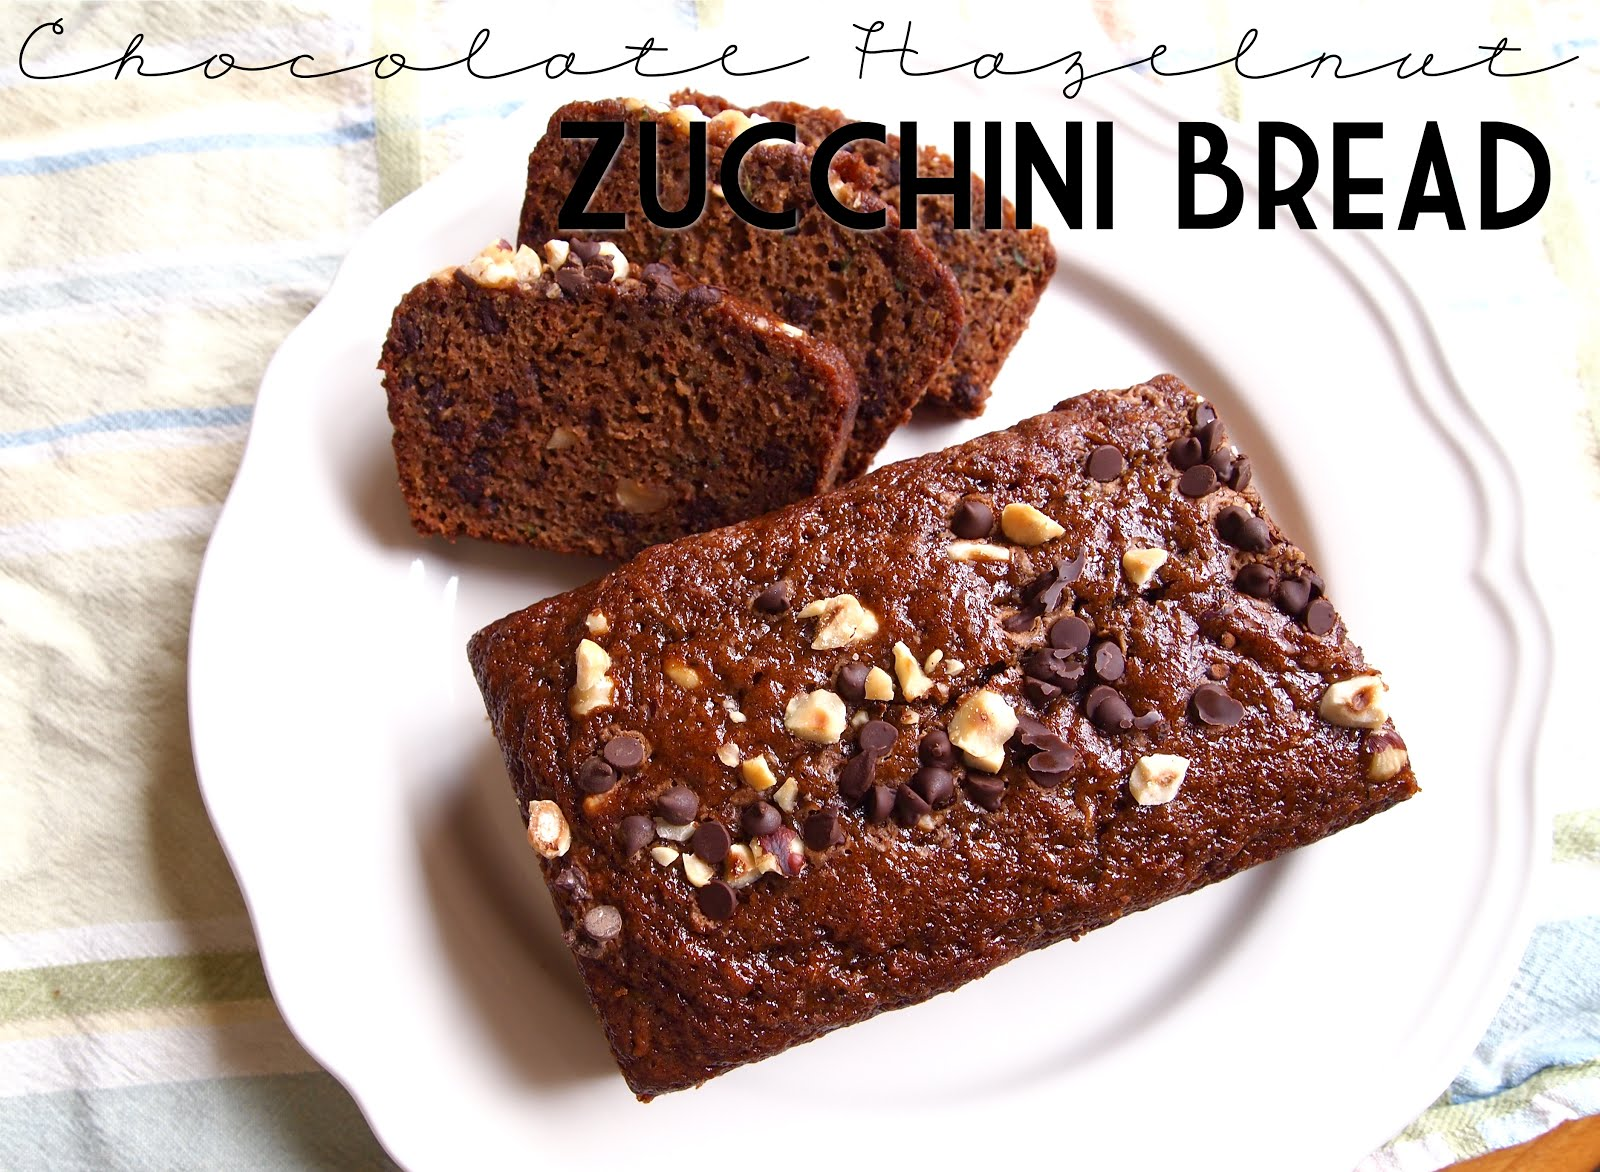 P B and J Eats: Chocolate Hazelnut Zucchini Bread